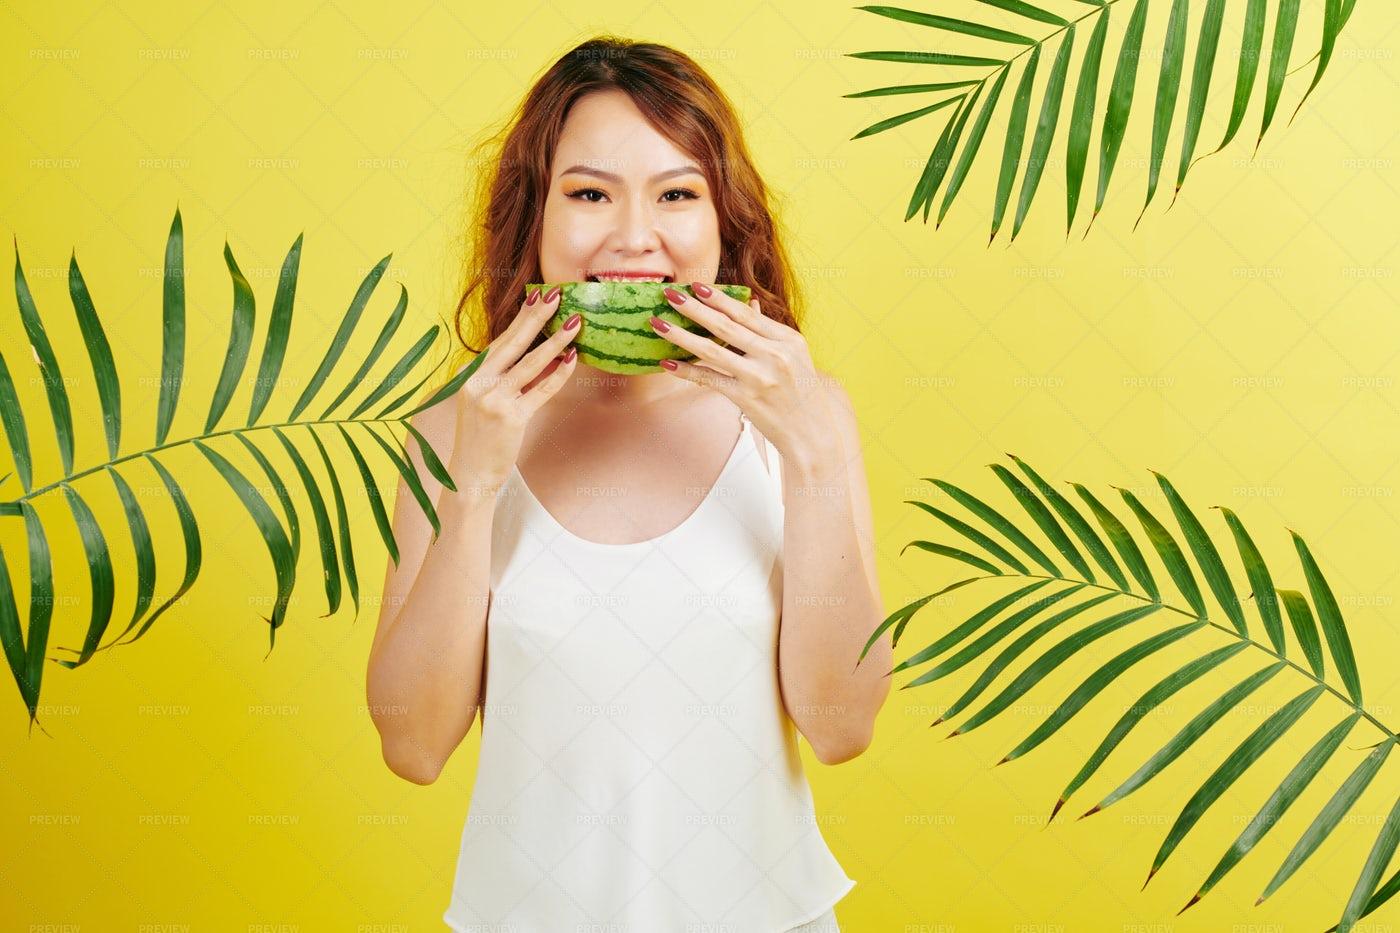 Woman Eating Watermelon: Stock Photos